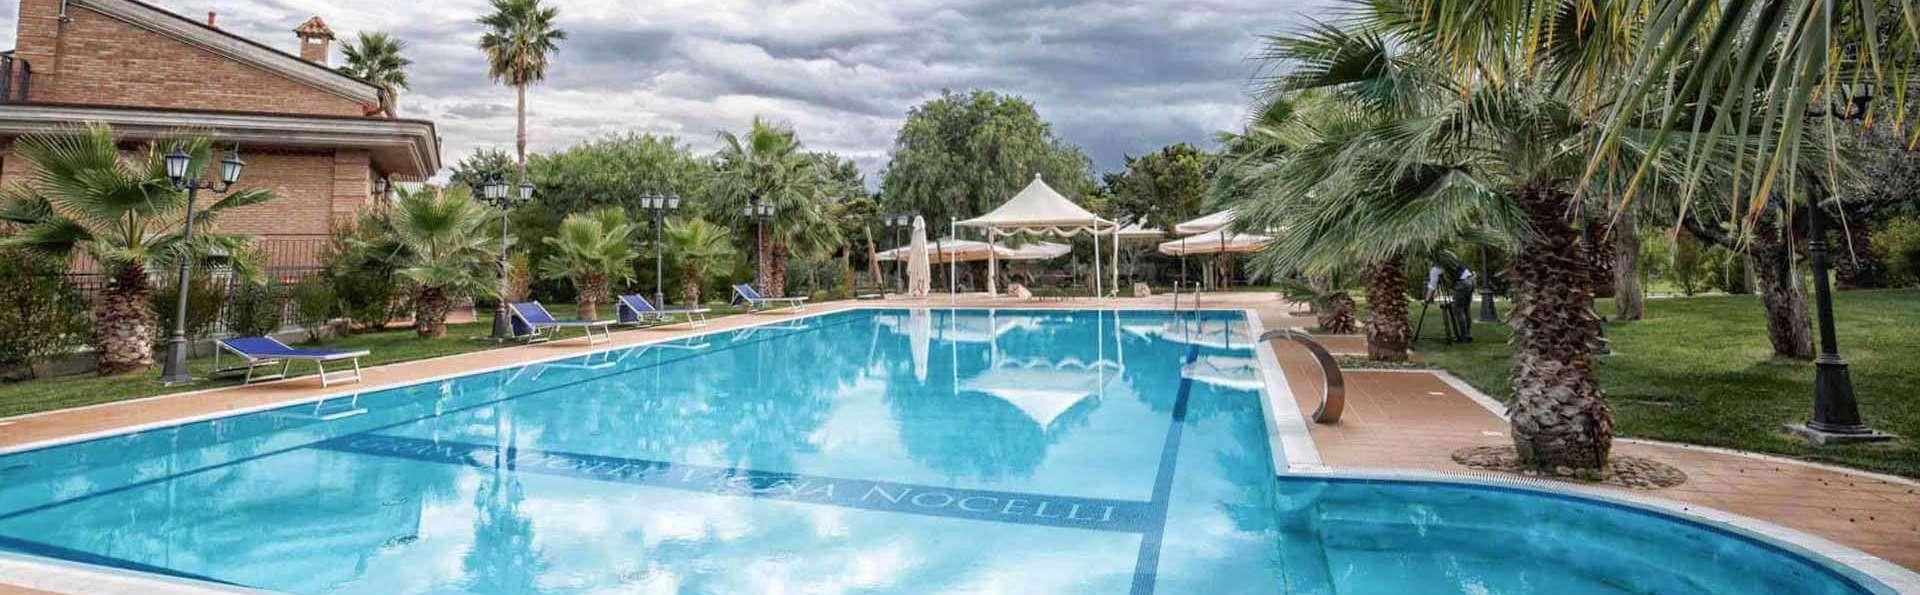 Grand Hotel Vigna Nocelli - EDIT_PISCINA_OSPITI_01.jpg